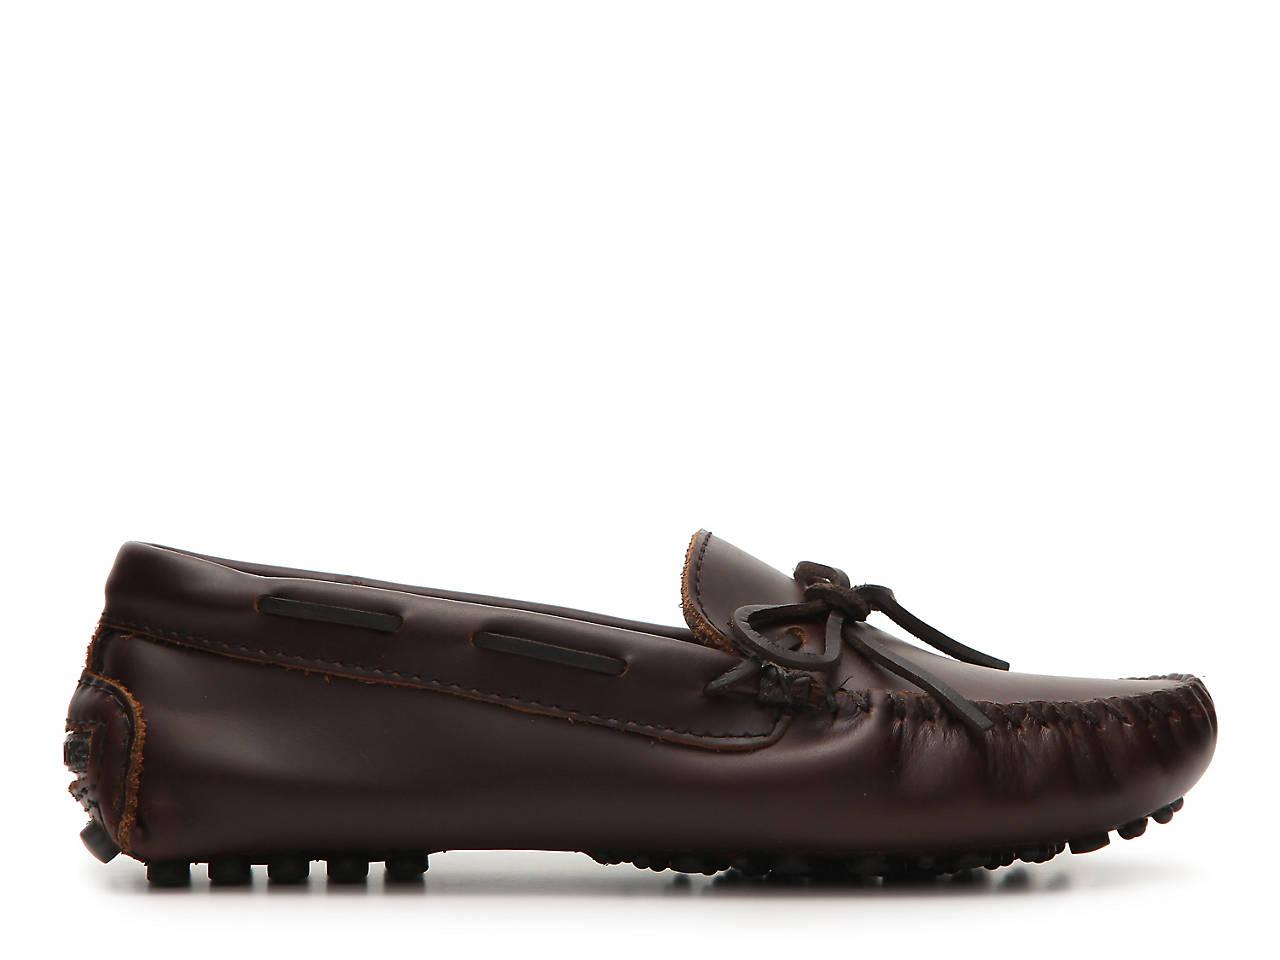 b16929ec Minnetonka Classic Driving Moccasin Women's Shoes | DSW